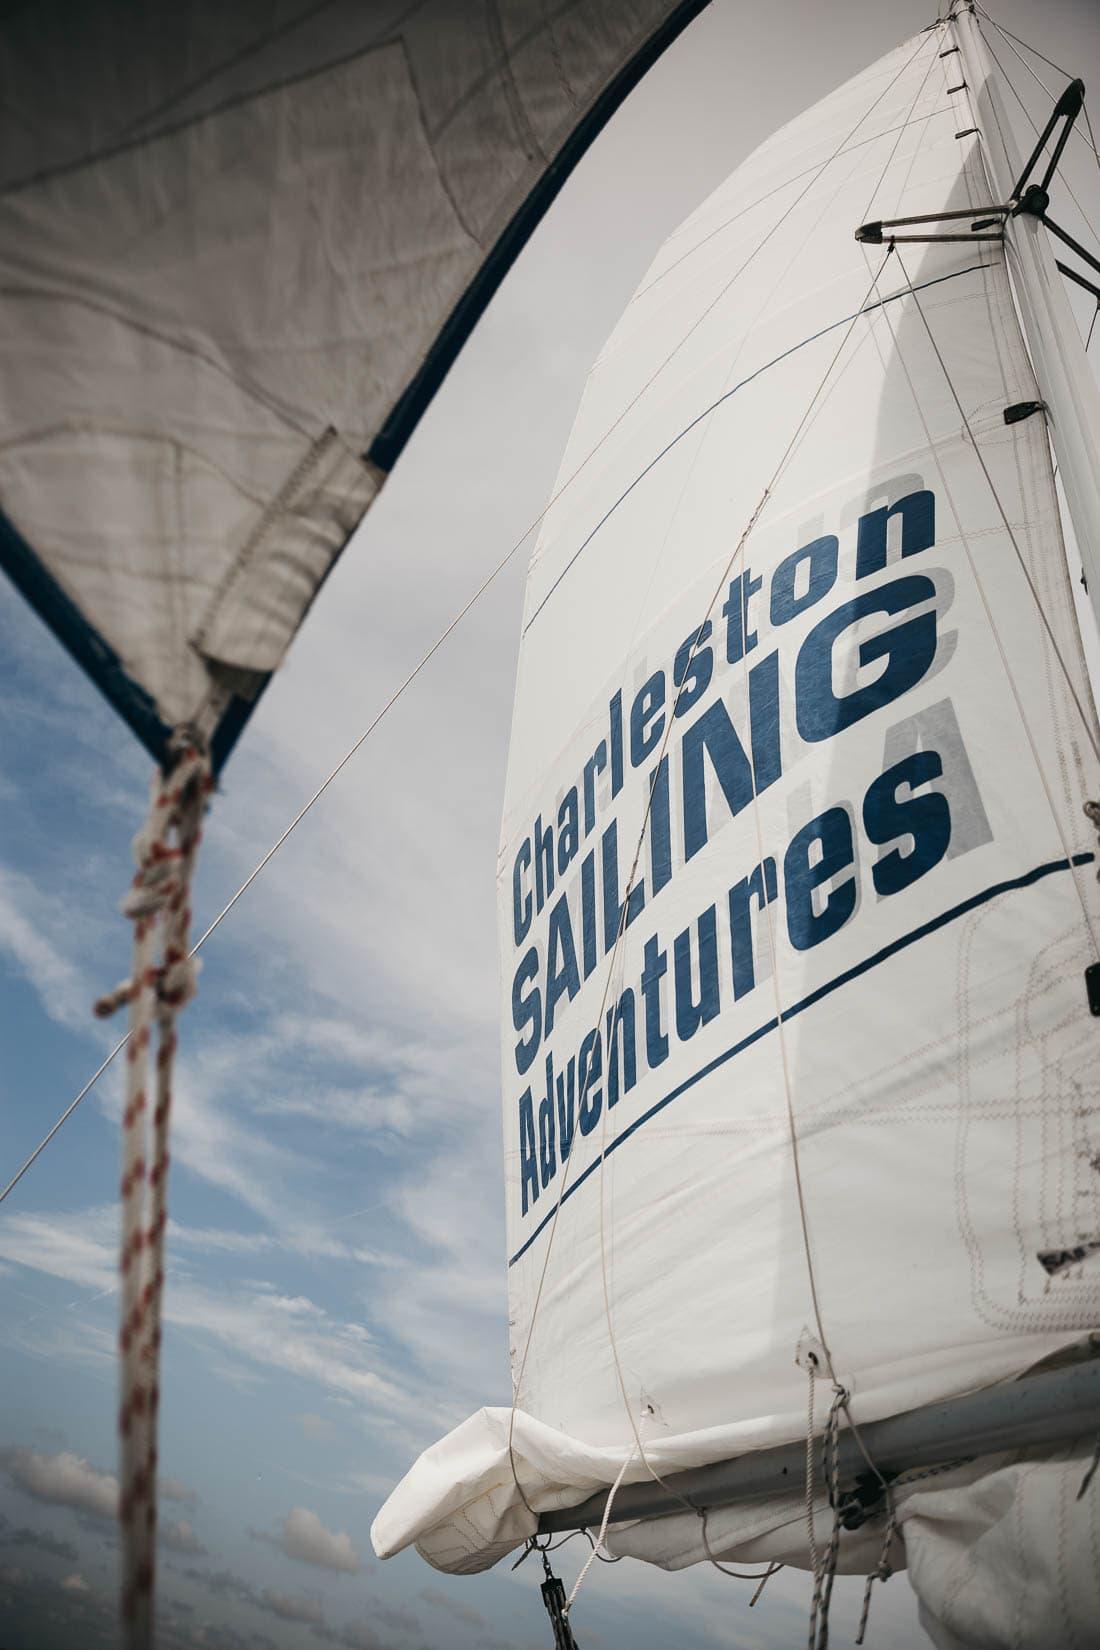 Charleston Sailing Adventures